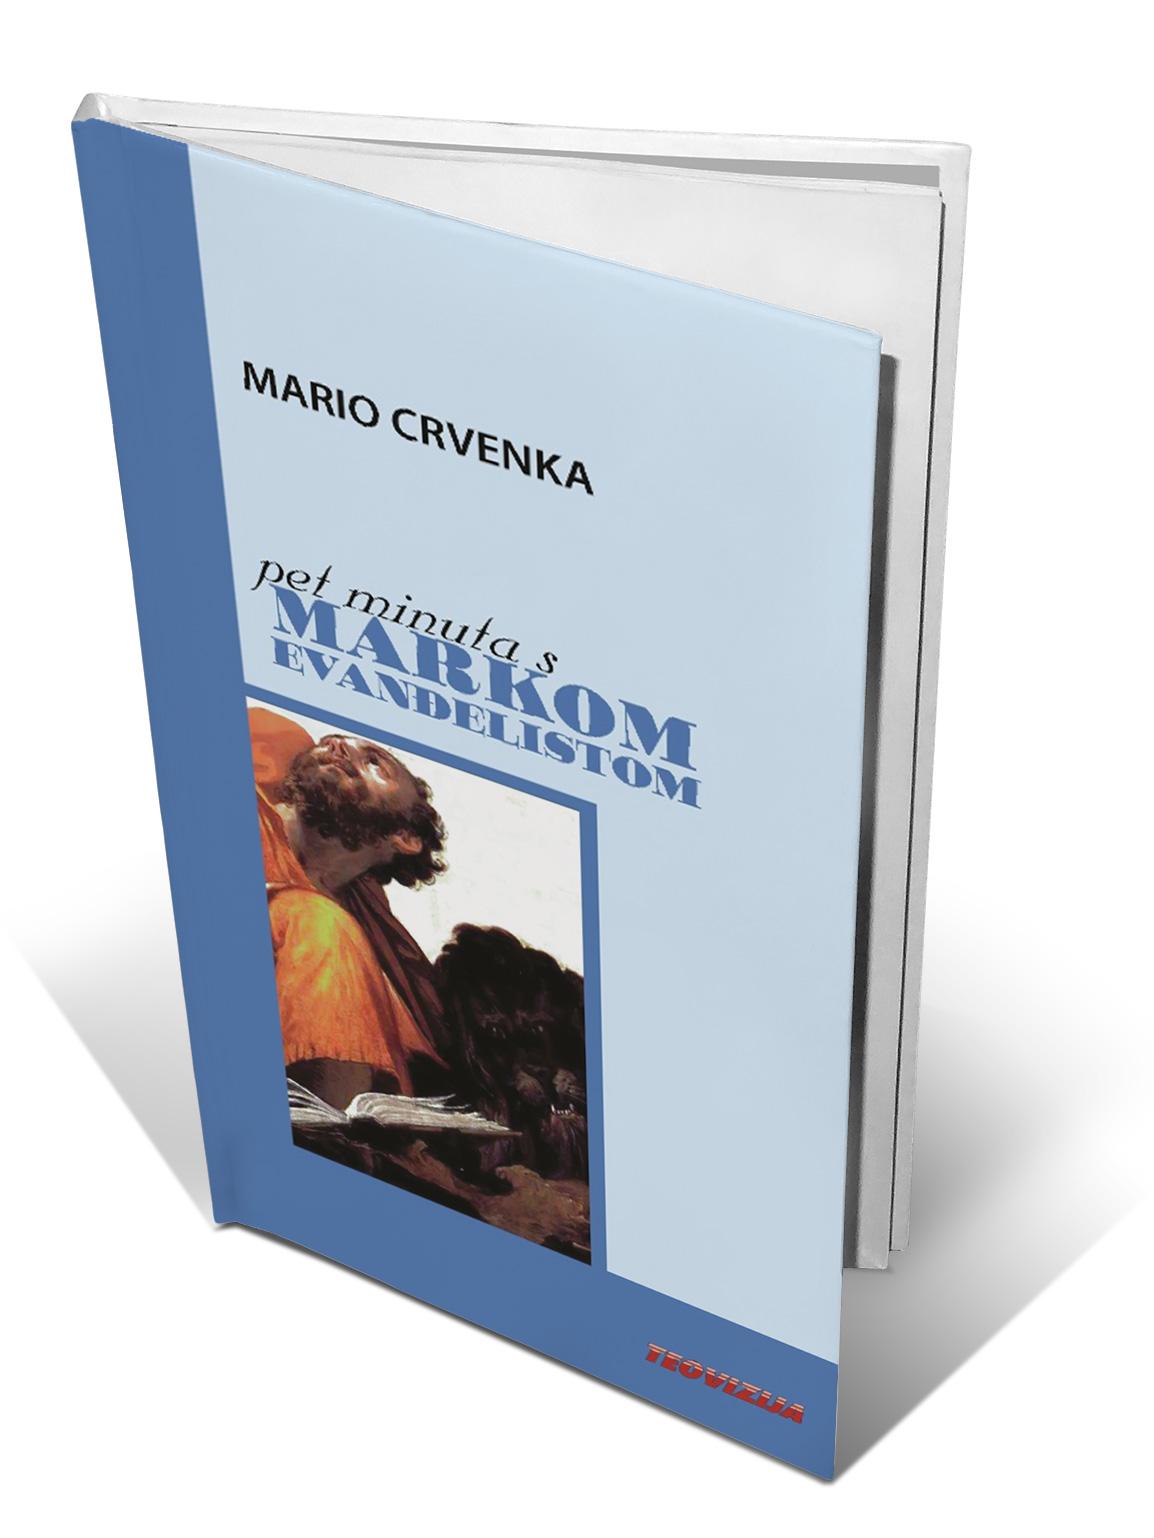 PET MINUTA S MARKOM EVANĐELISTOM - Mario Crvenka